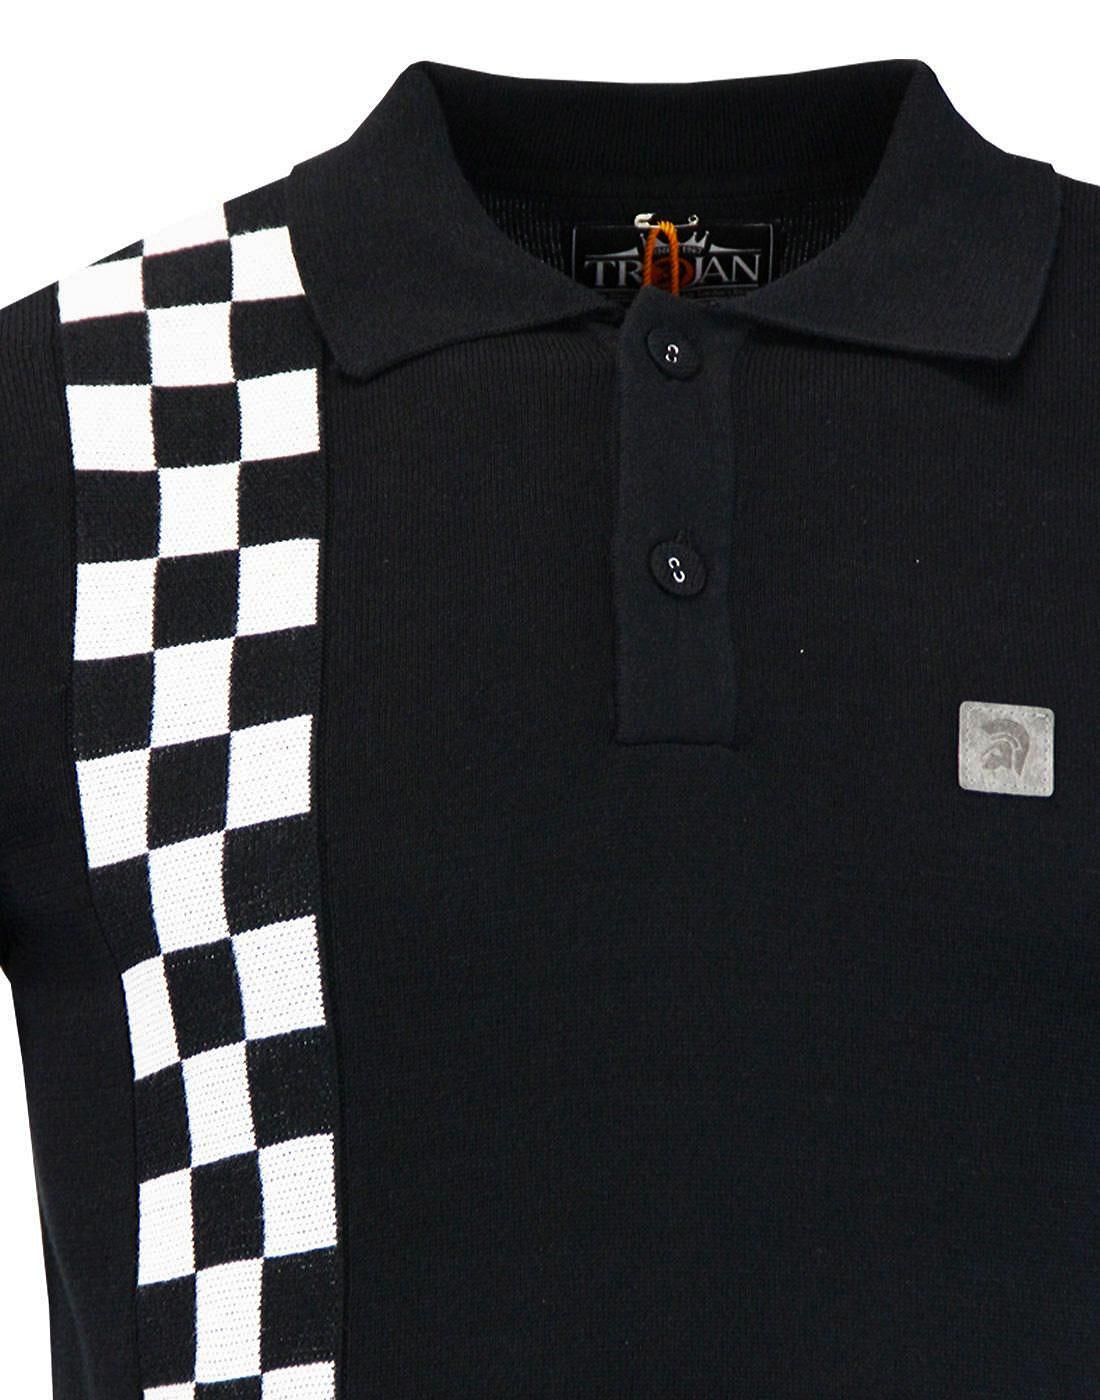 1dfa4cc37 TROJAN RECORDS Retro Mod Ska Check Knitted Polo Shirt in Black